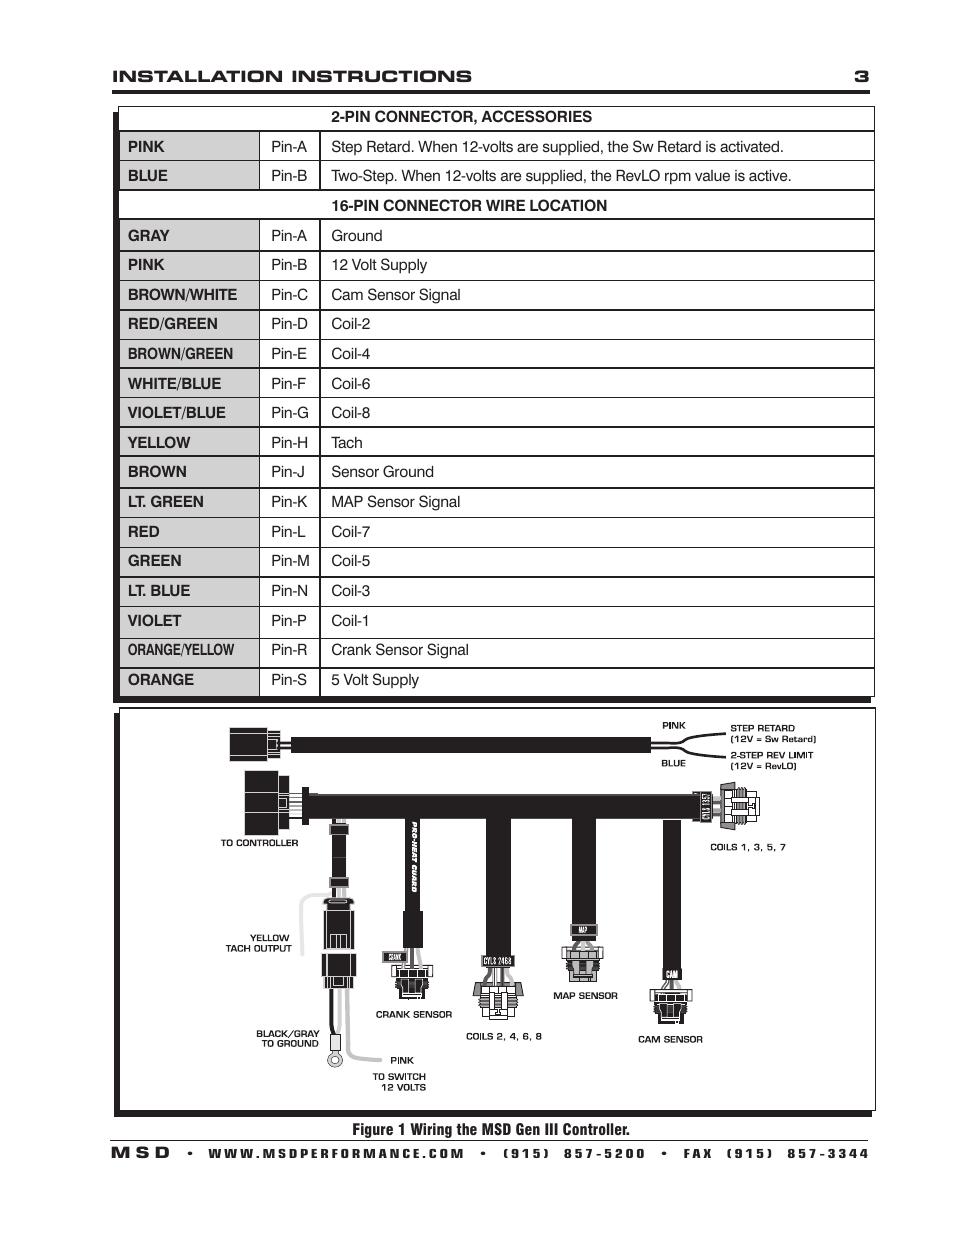 hunter 27183 wiring diagram best of diagram pdf msd map sensor wiring diagram millions ideas  pdf msd map sensor wiring diagram